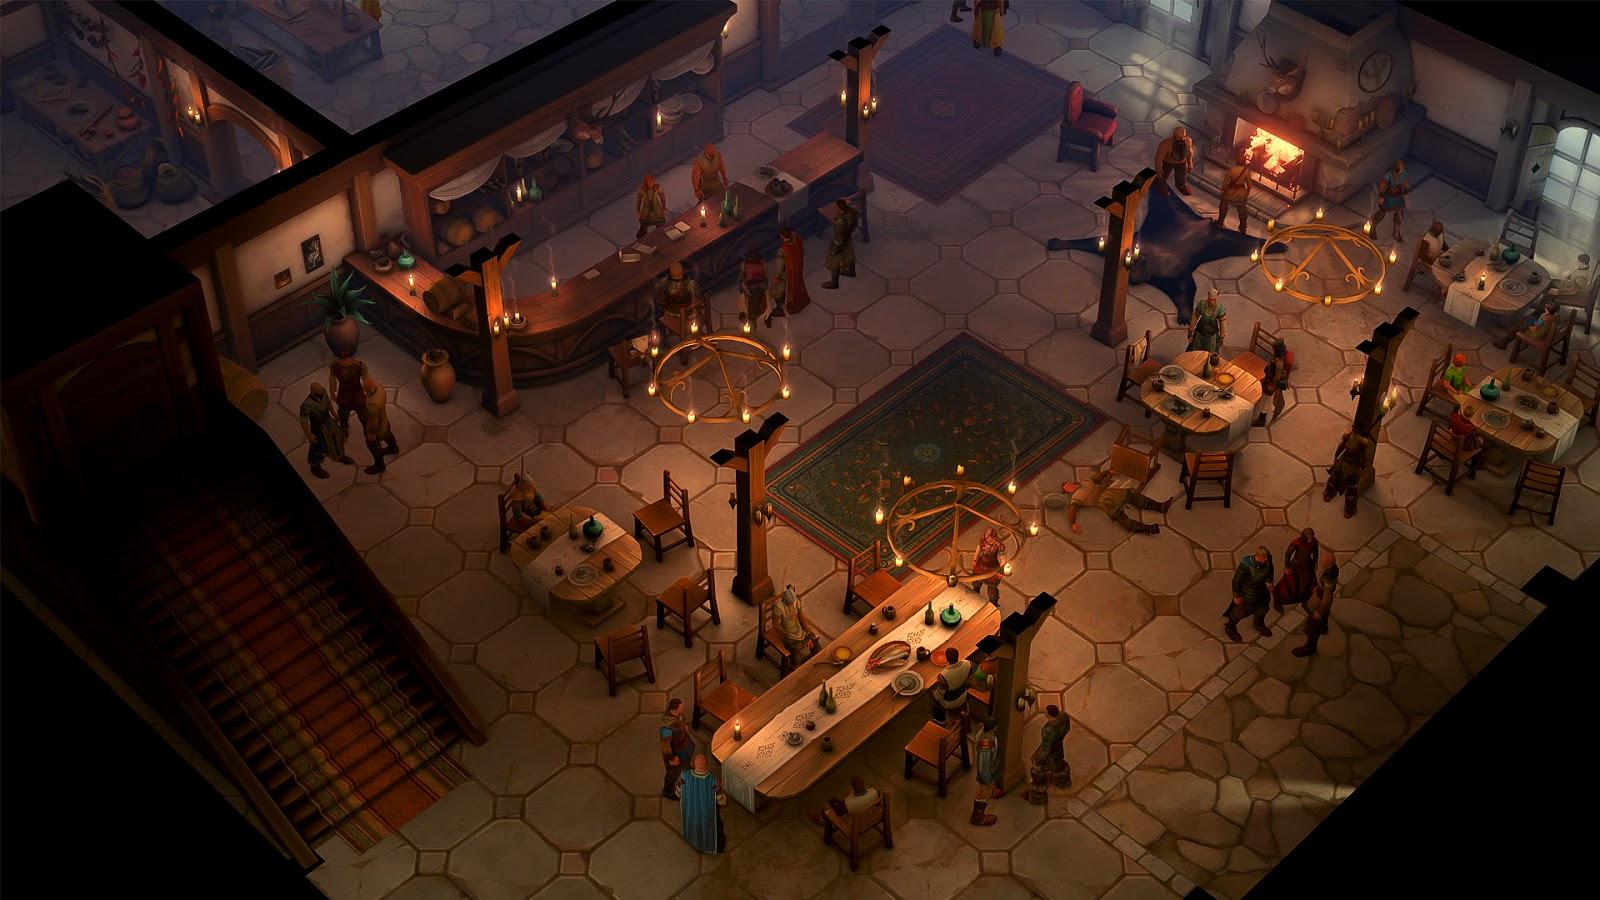 pathfinder-kingmaker-pc-screenshot-03